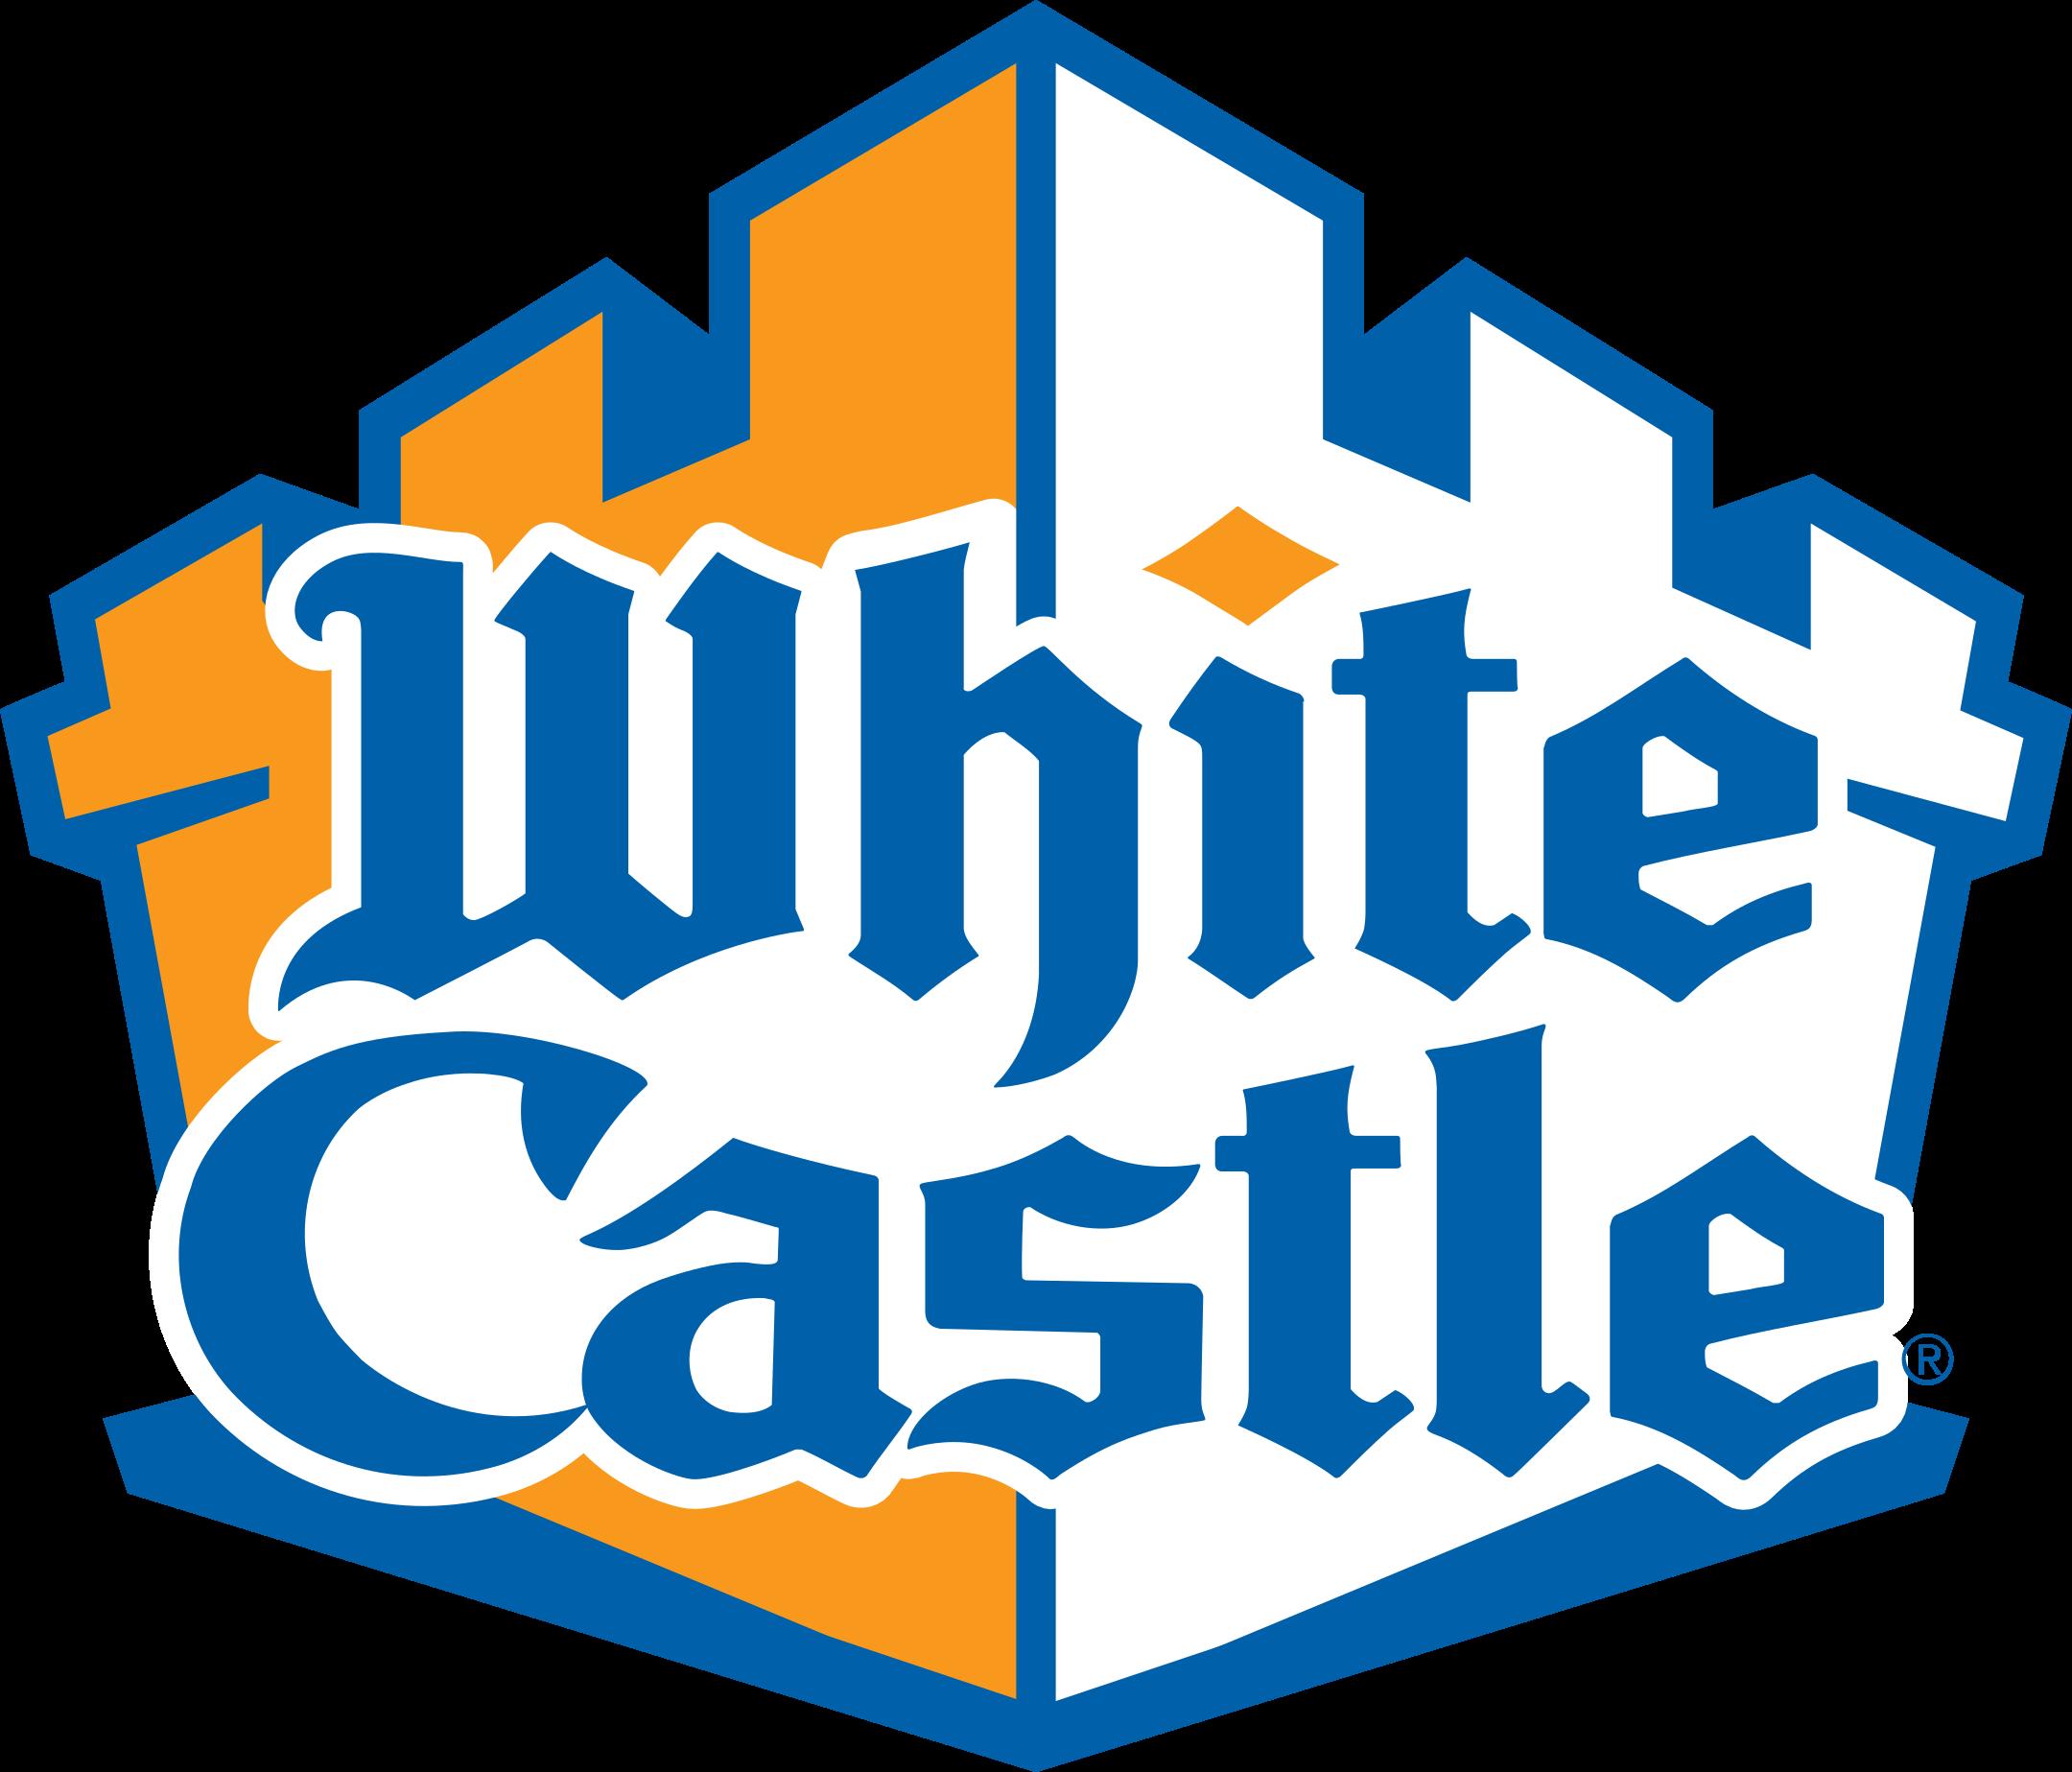 white castle logo 1 - White Castle Logo